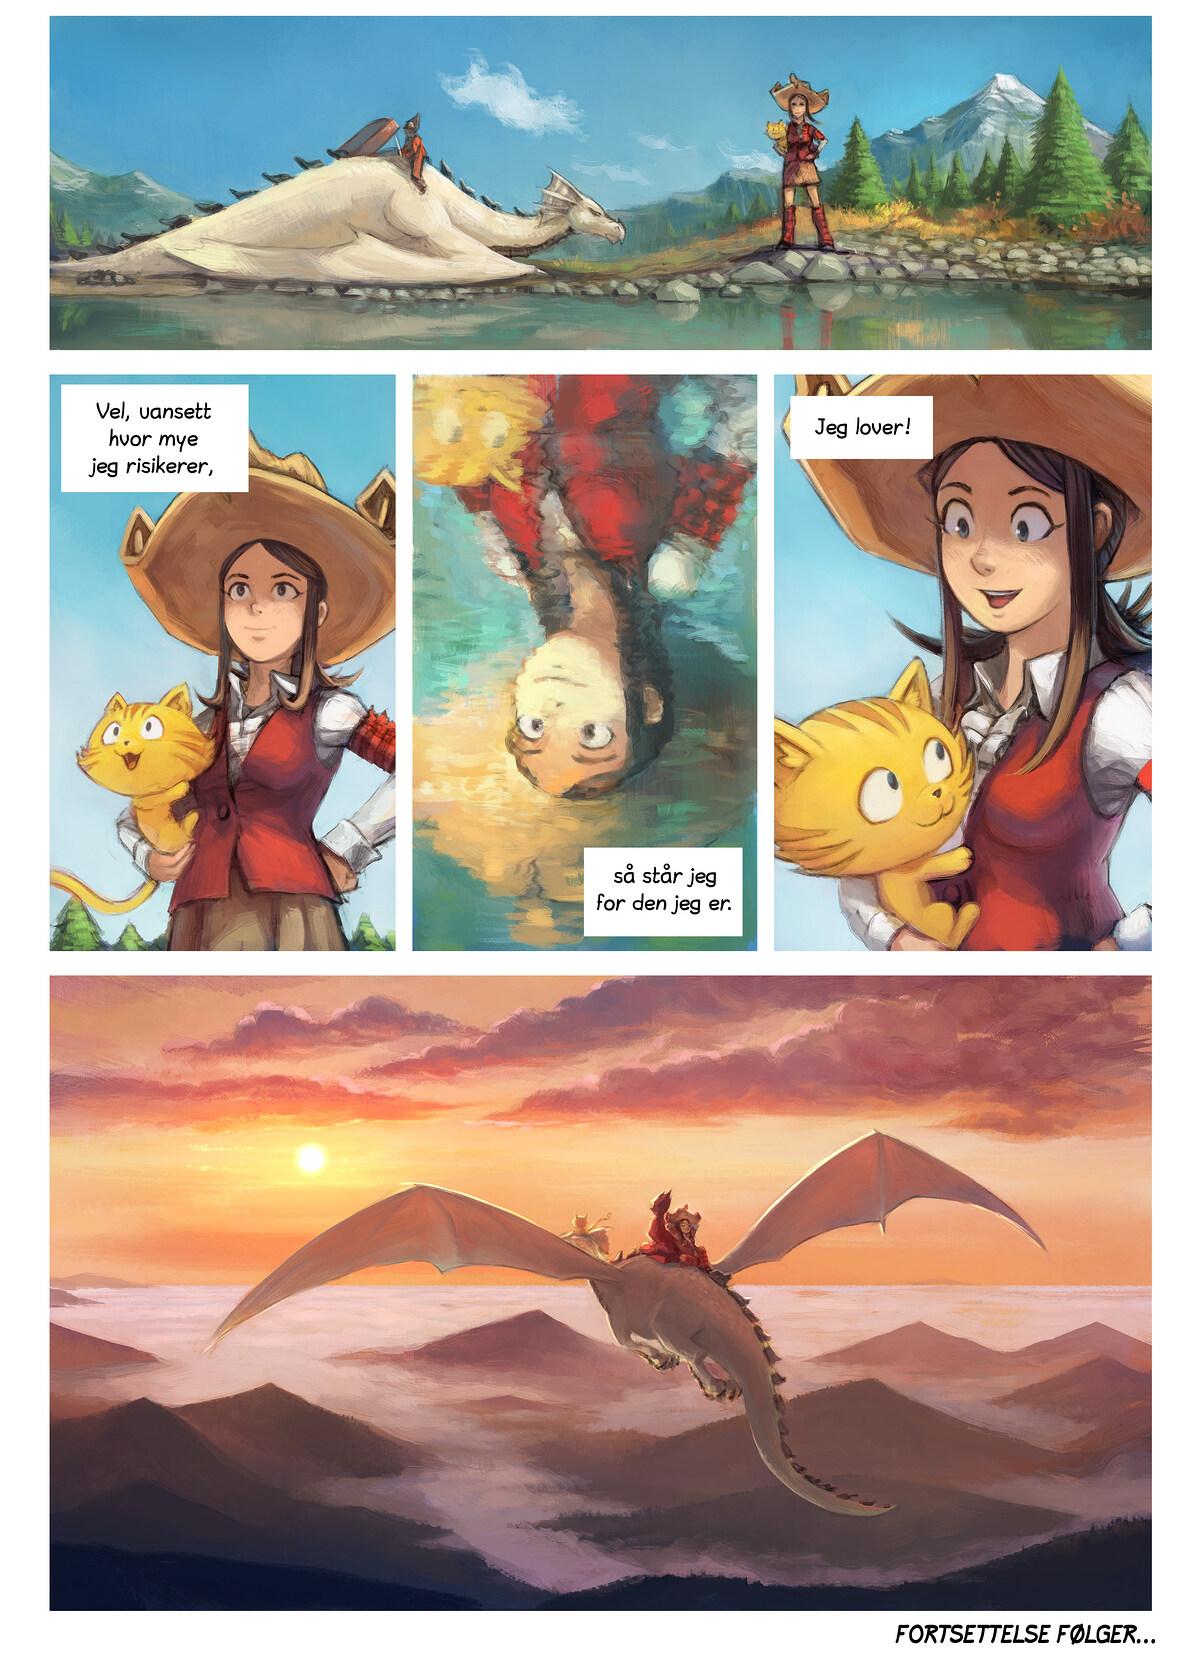 Episode 35: Tid for ettertanke, Page 12